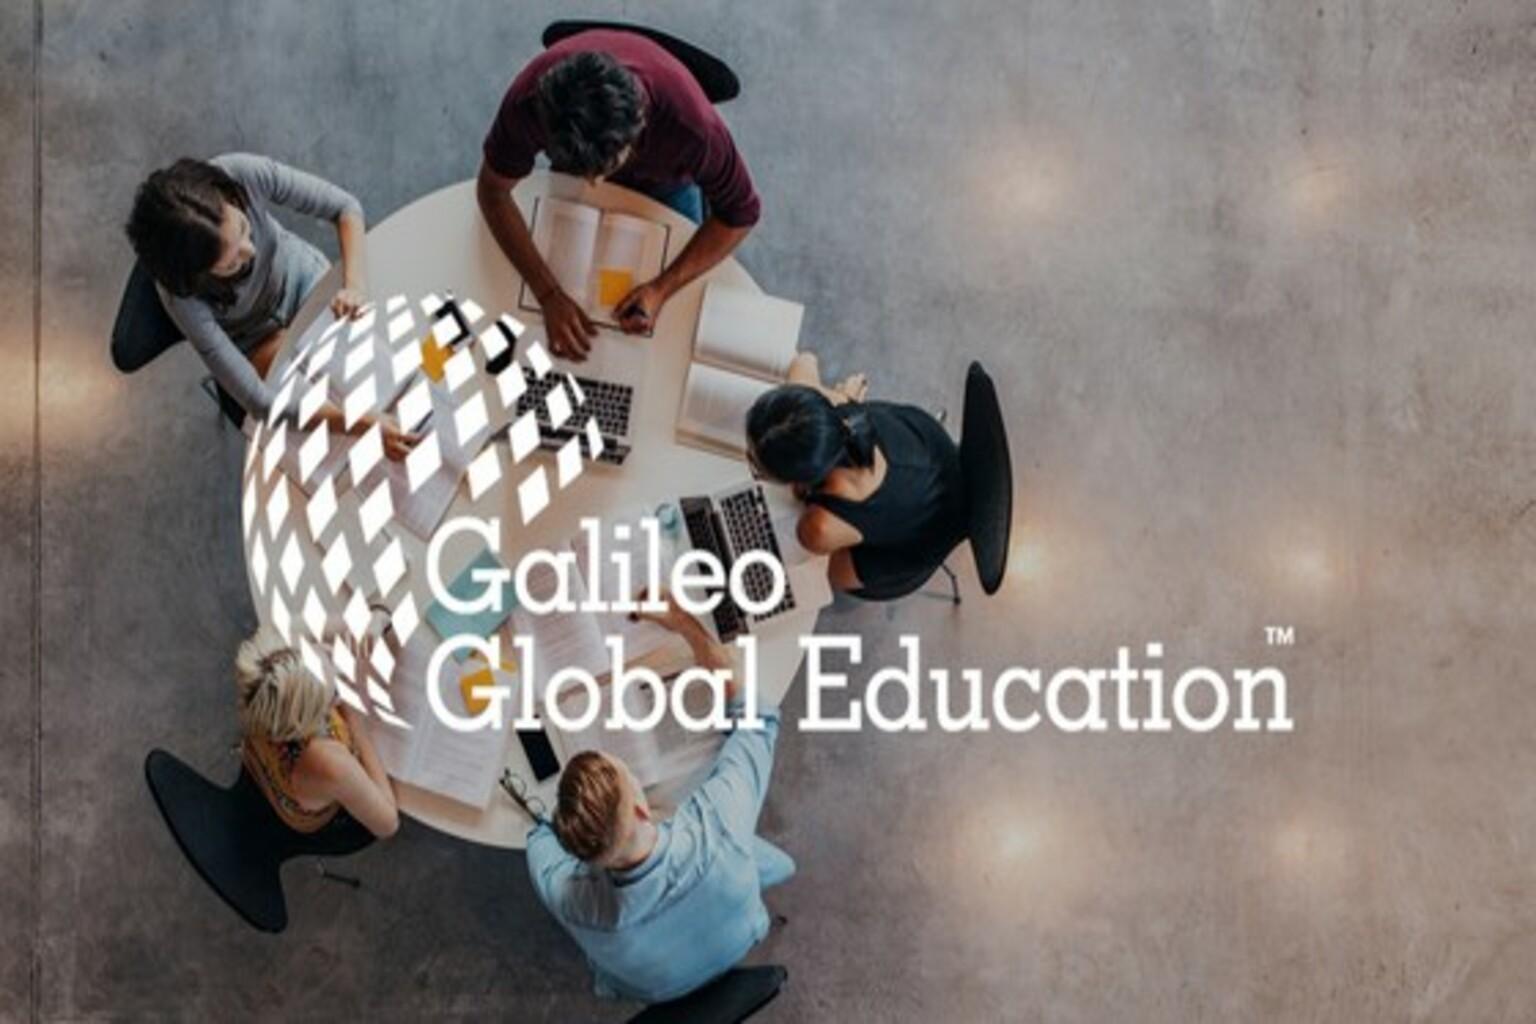 galileo-cch-tagetik-satriun-consolidation-thumbnail